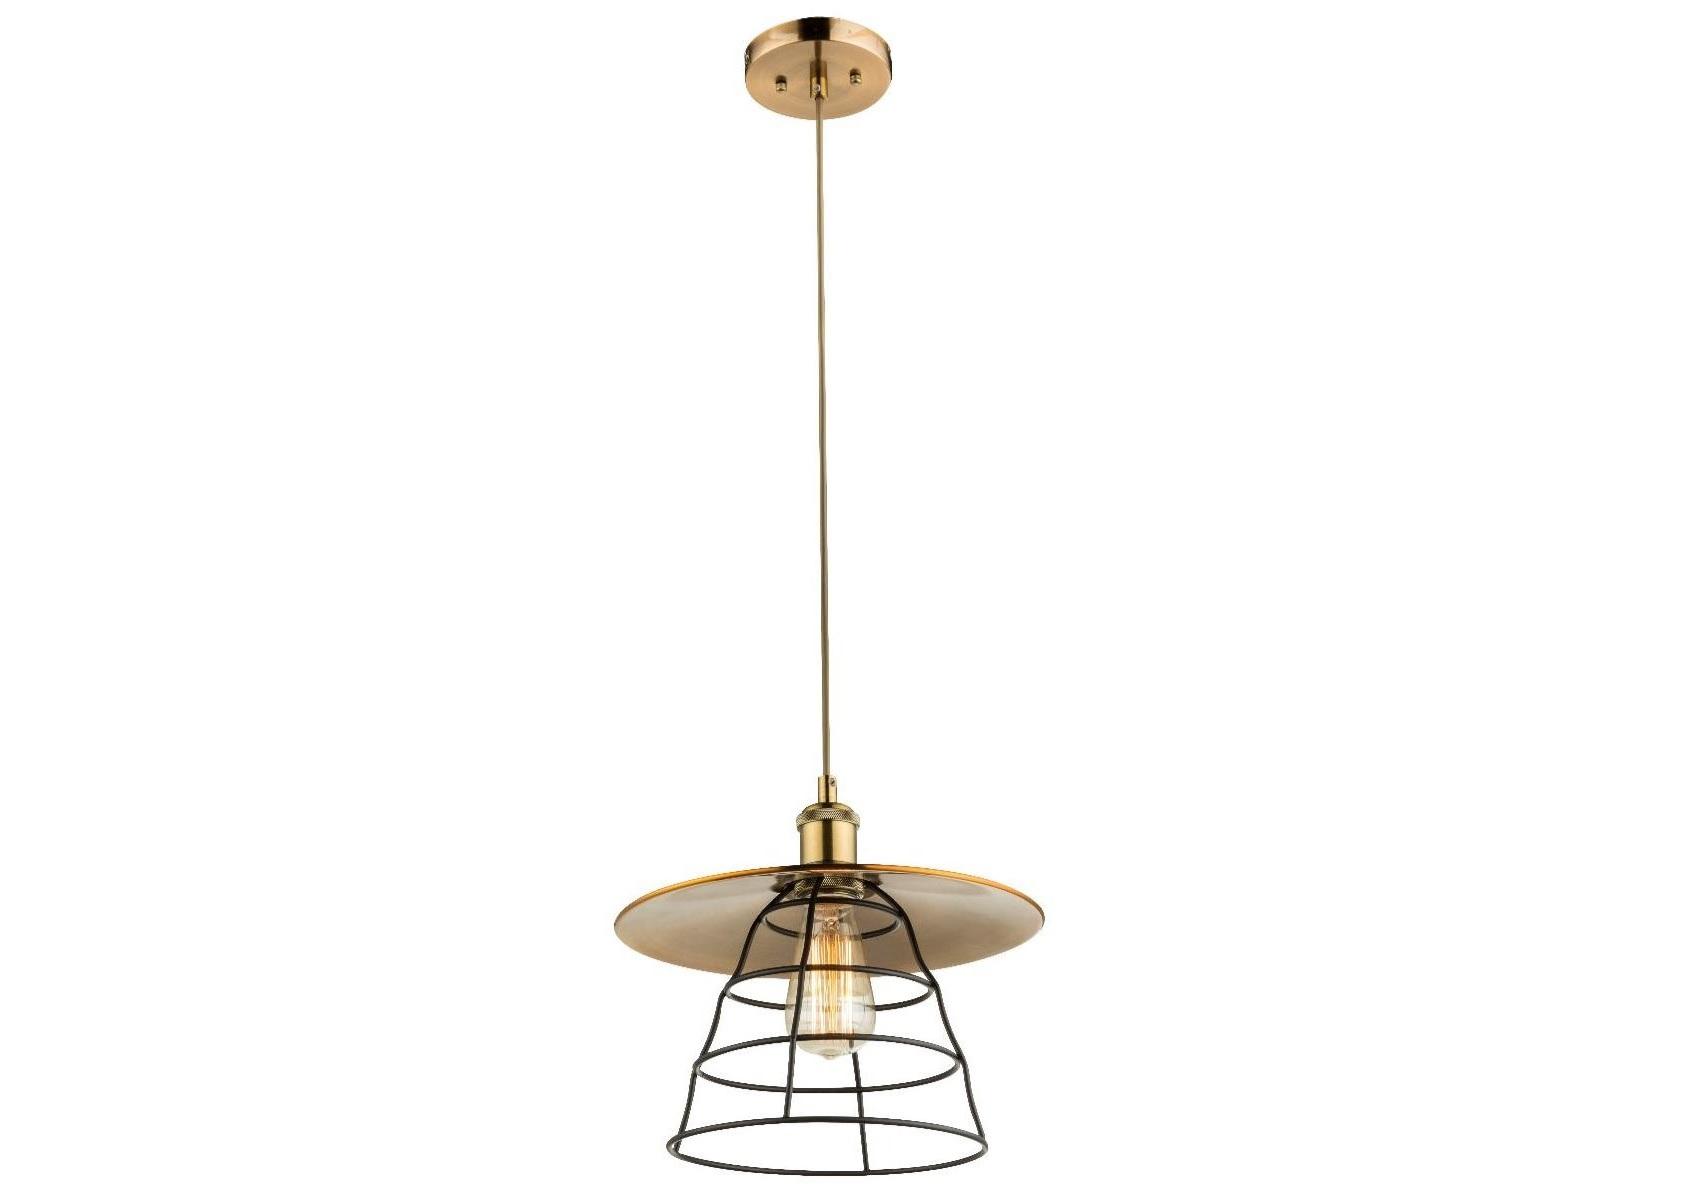 Светильник подвеснойПодвесные светильники<br>&amp;lt;div&amp;gt;&amp;lt;div&amp;gt;Вид цоколя: E27&amp;lt;/div&amp;gt;&amp;lt;div&amp;gt;Мощность лампы: 60W&amp;lt;/div&amp;gt;&amp;lt;div&amp;gt;Количество ламп: 1&amp;lt;/div&amp;gt;&amp;lt;/div&amp;gt;<br><br>Material: Металл<br>Height см: 150<br>Diameter см: 22